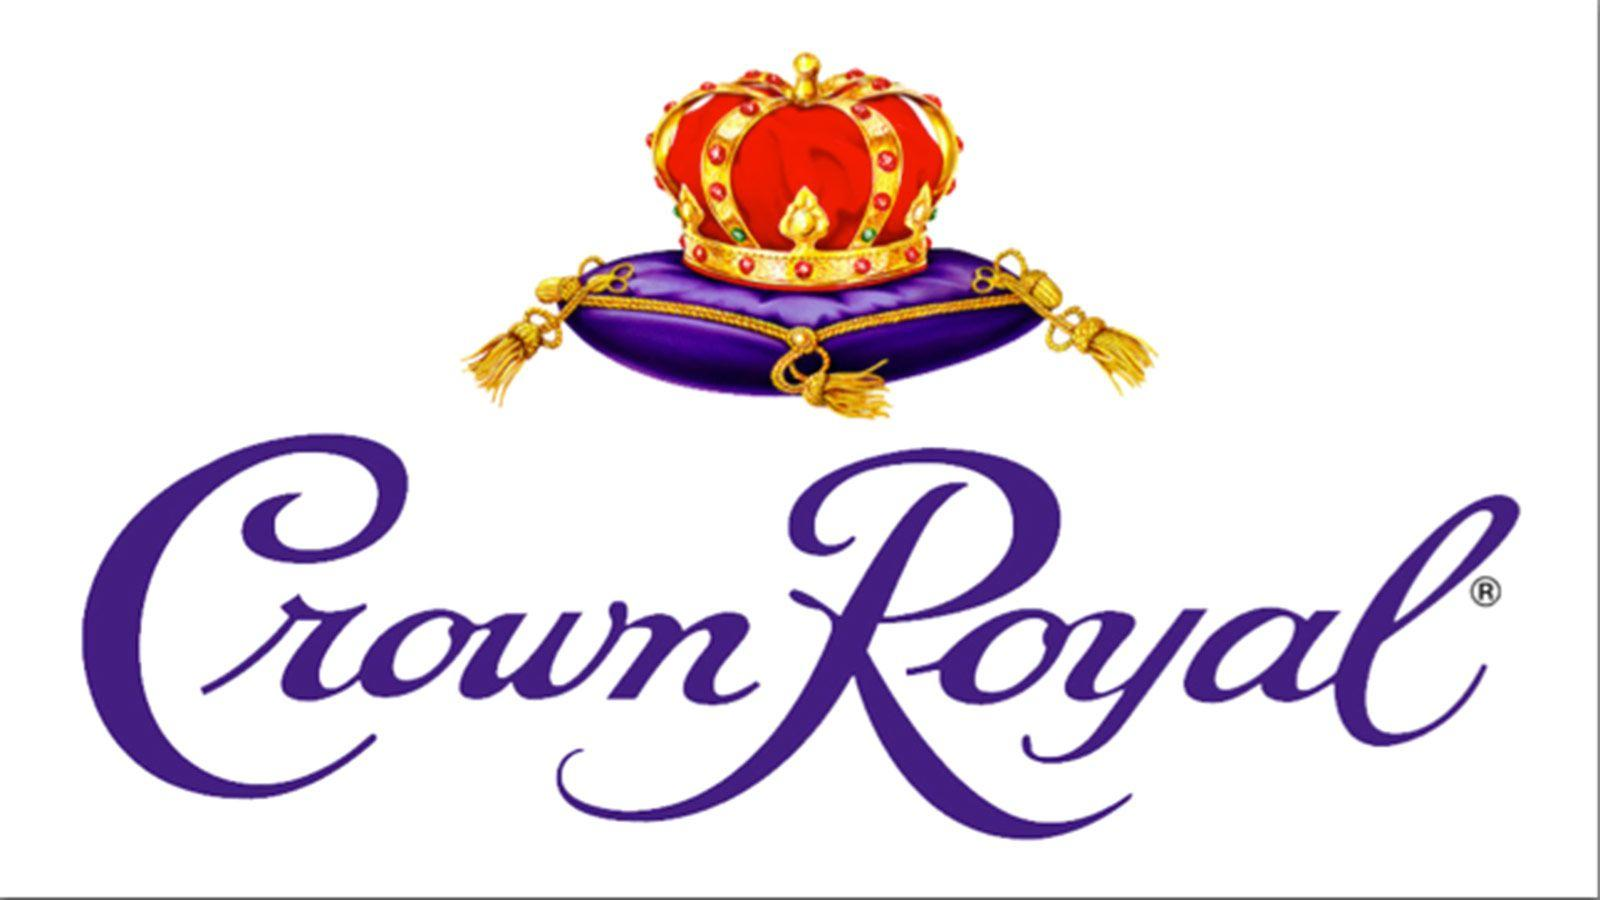 Crown Royal Wallpapers - Wallpaper Cave